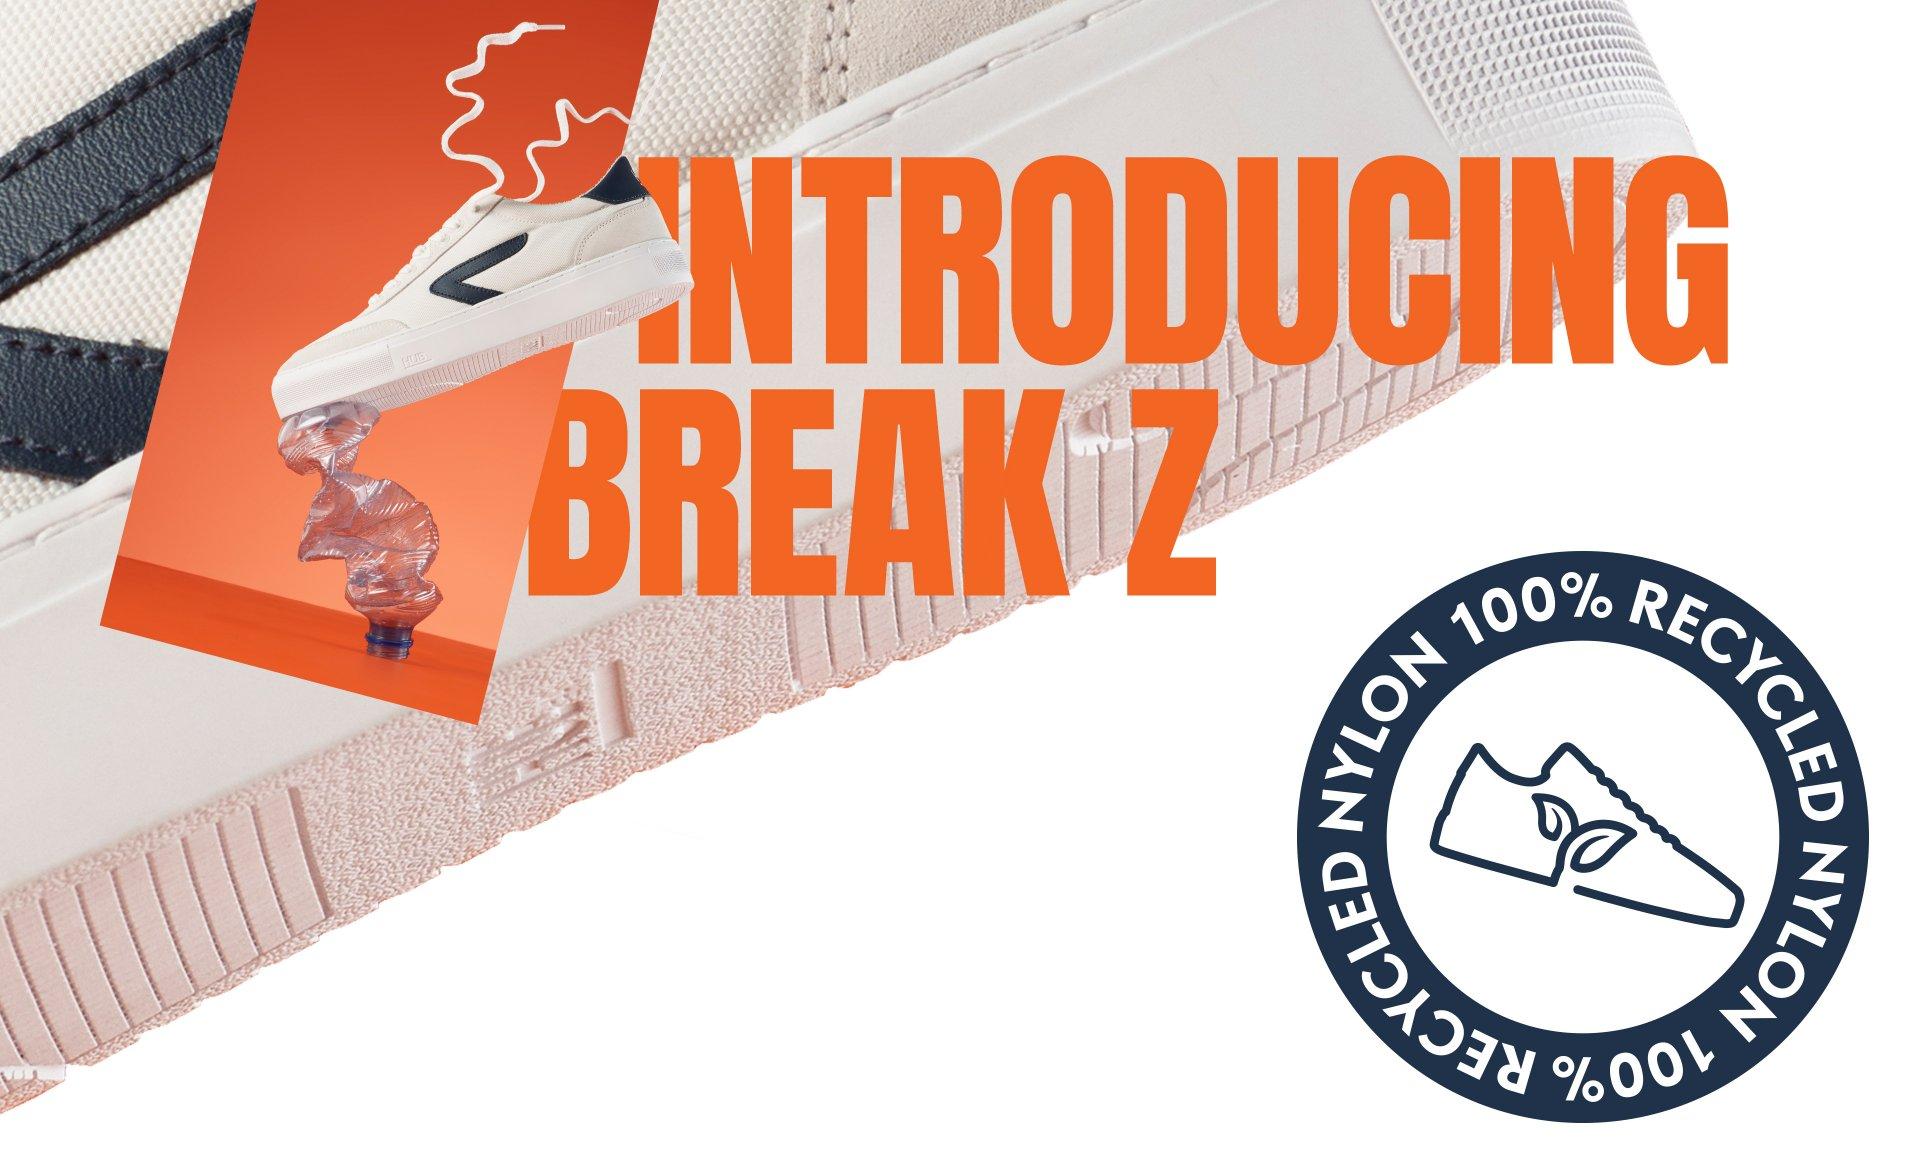 Break Z